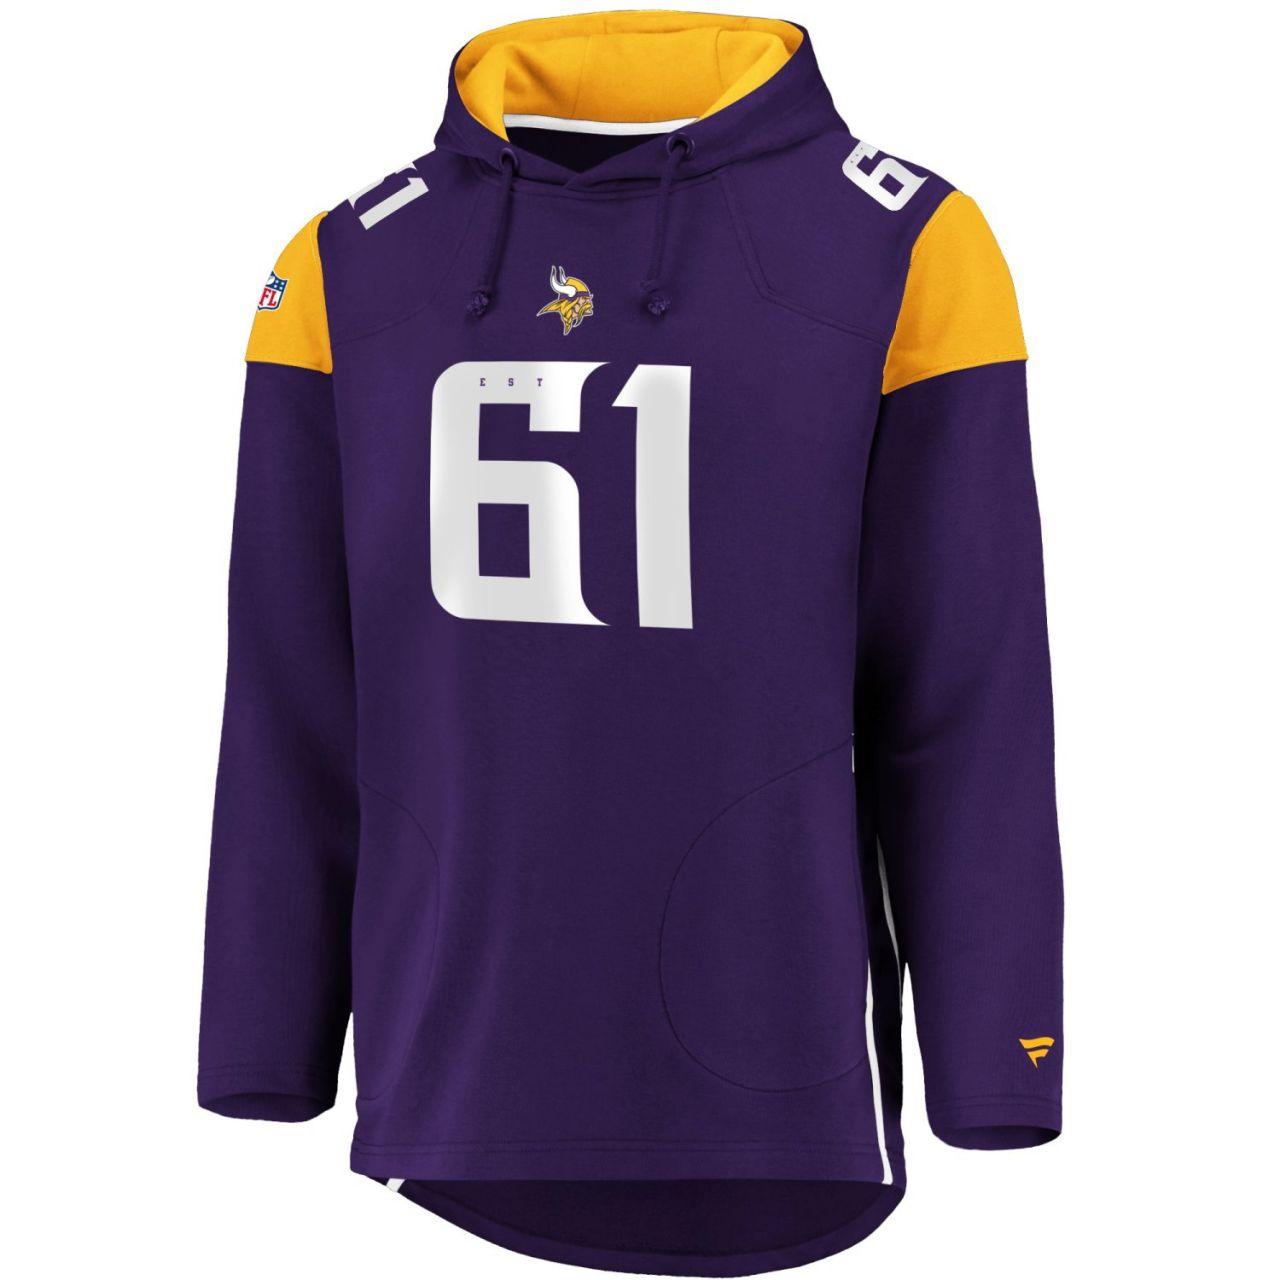 amfoo - Iconic Franchise Long Hoodie - NFL Minnesota Vikings